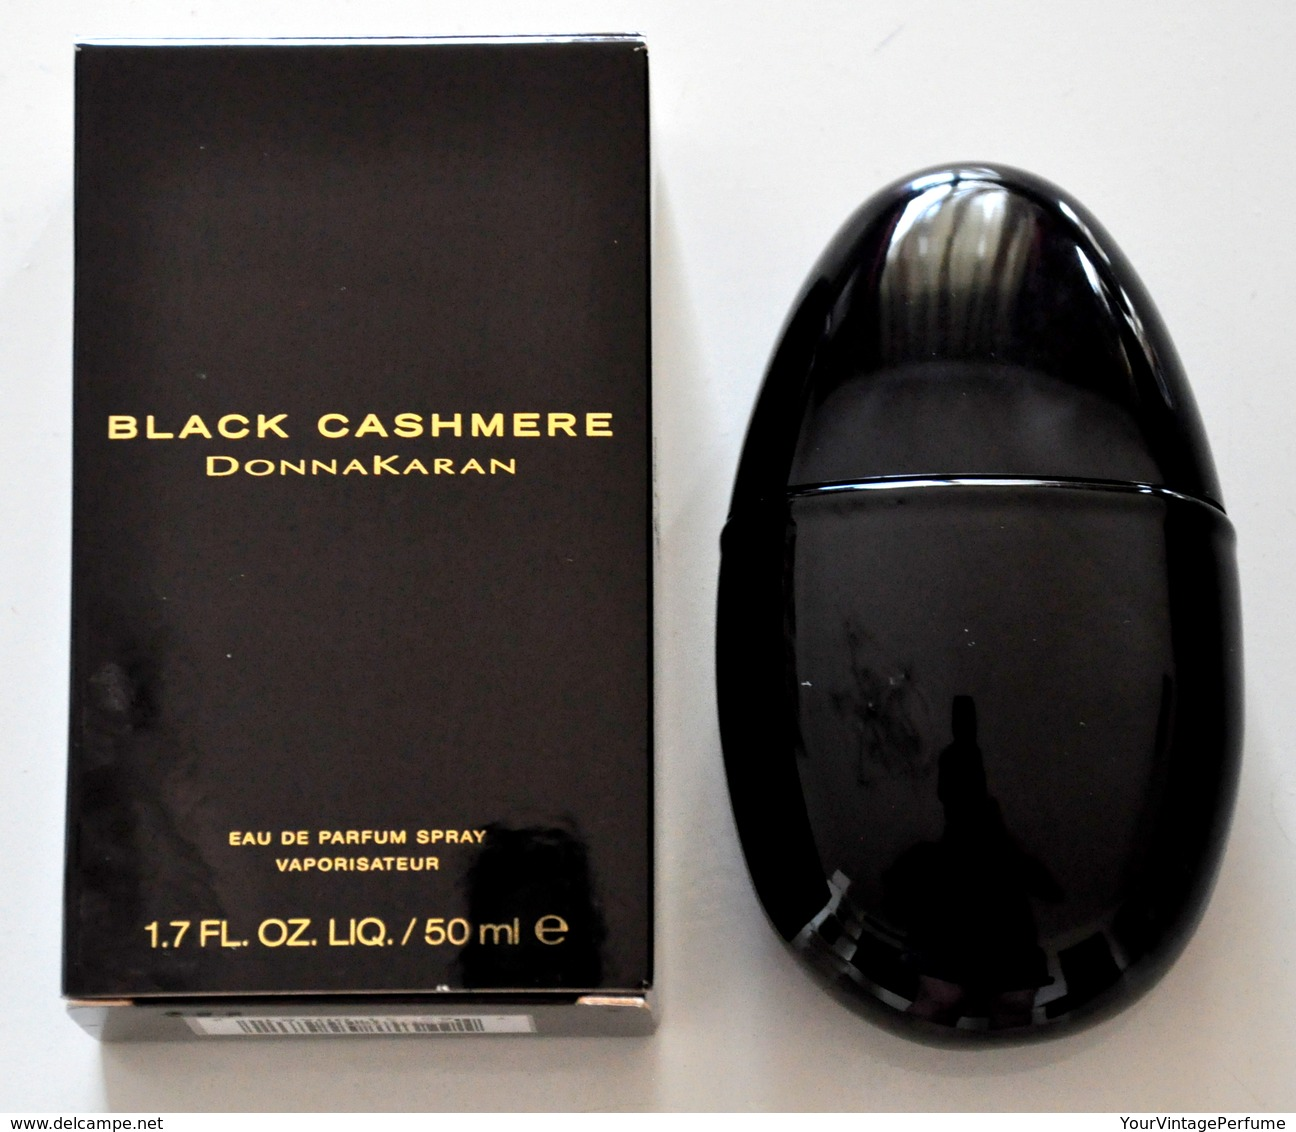 Donna Karan Black Cashmere Eau De Parfum Edp Spray 50ML Fl. Oz. 1.7 Perfume Woman Rare Vintage Old 2002 - Fragrances (new And Unused)